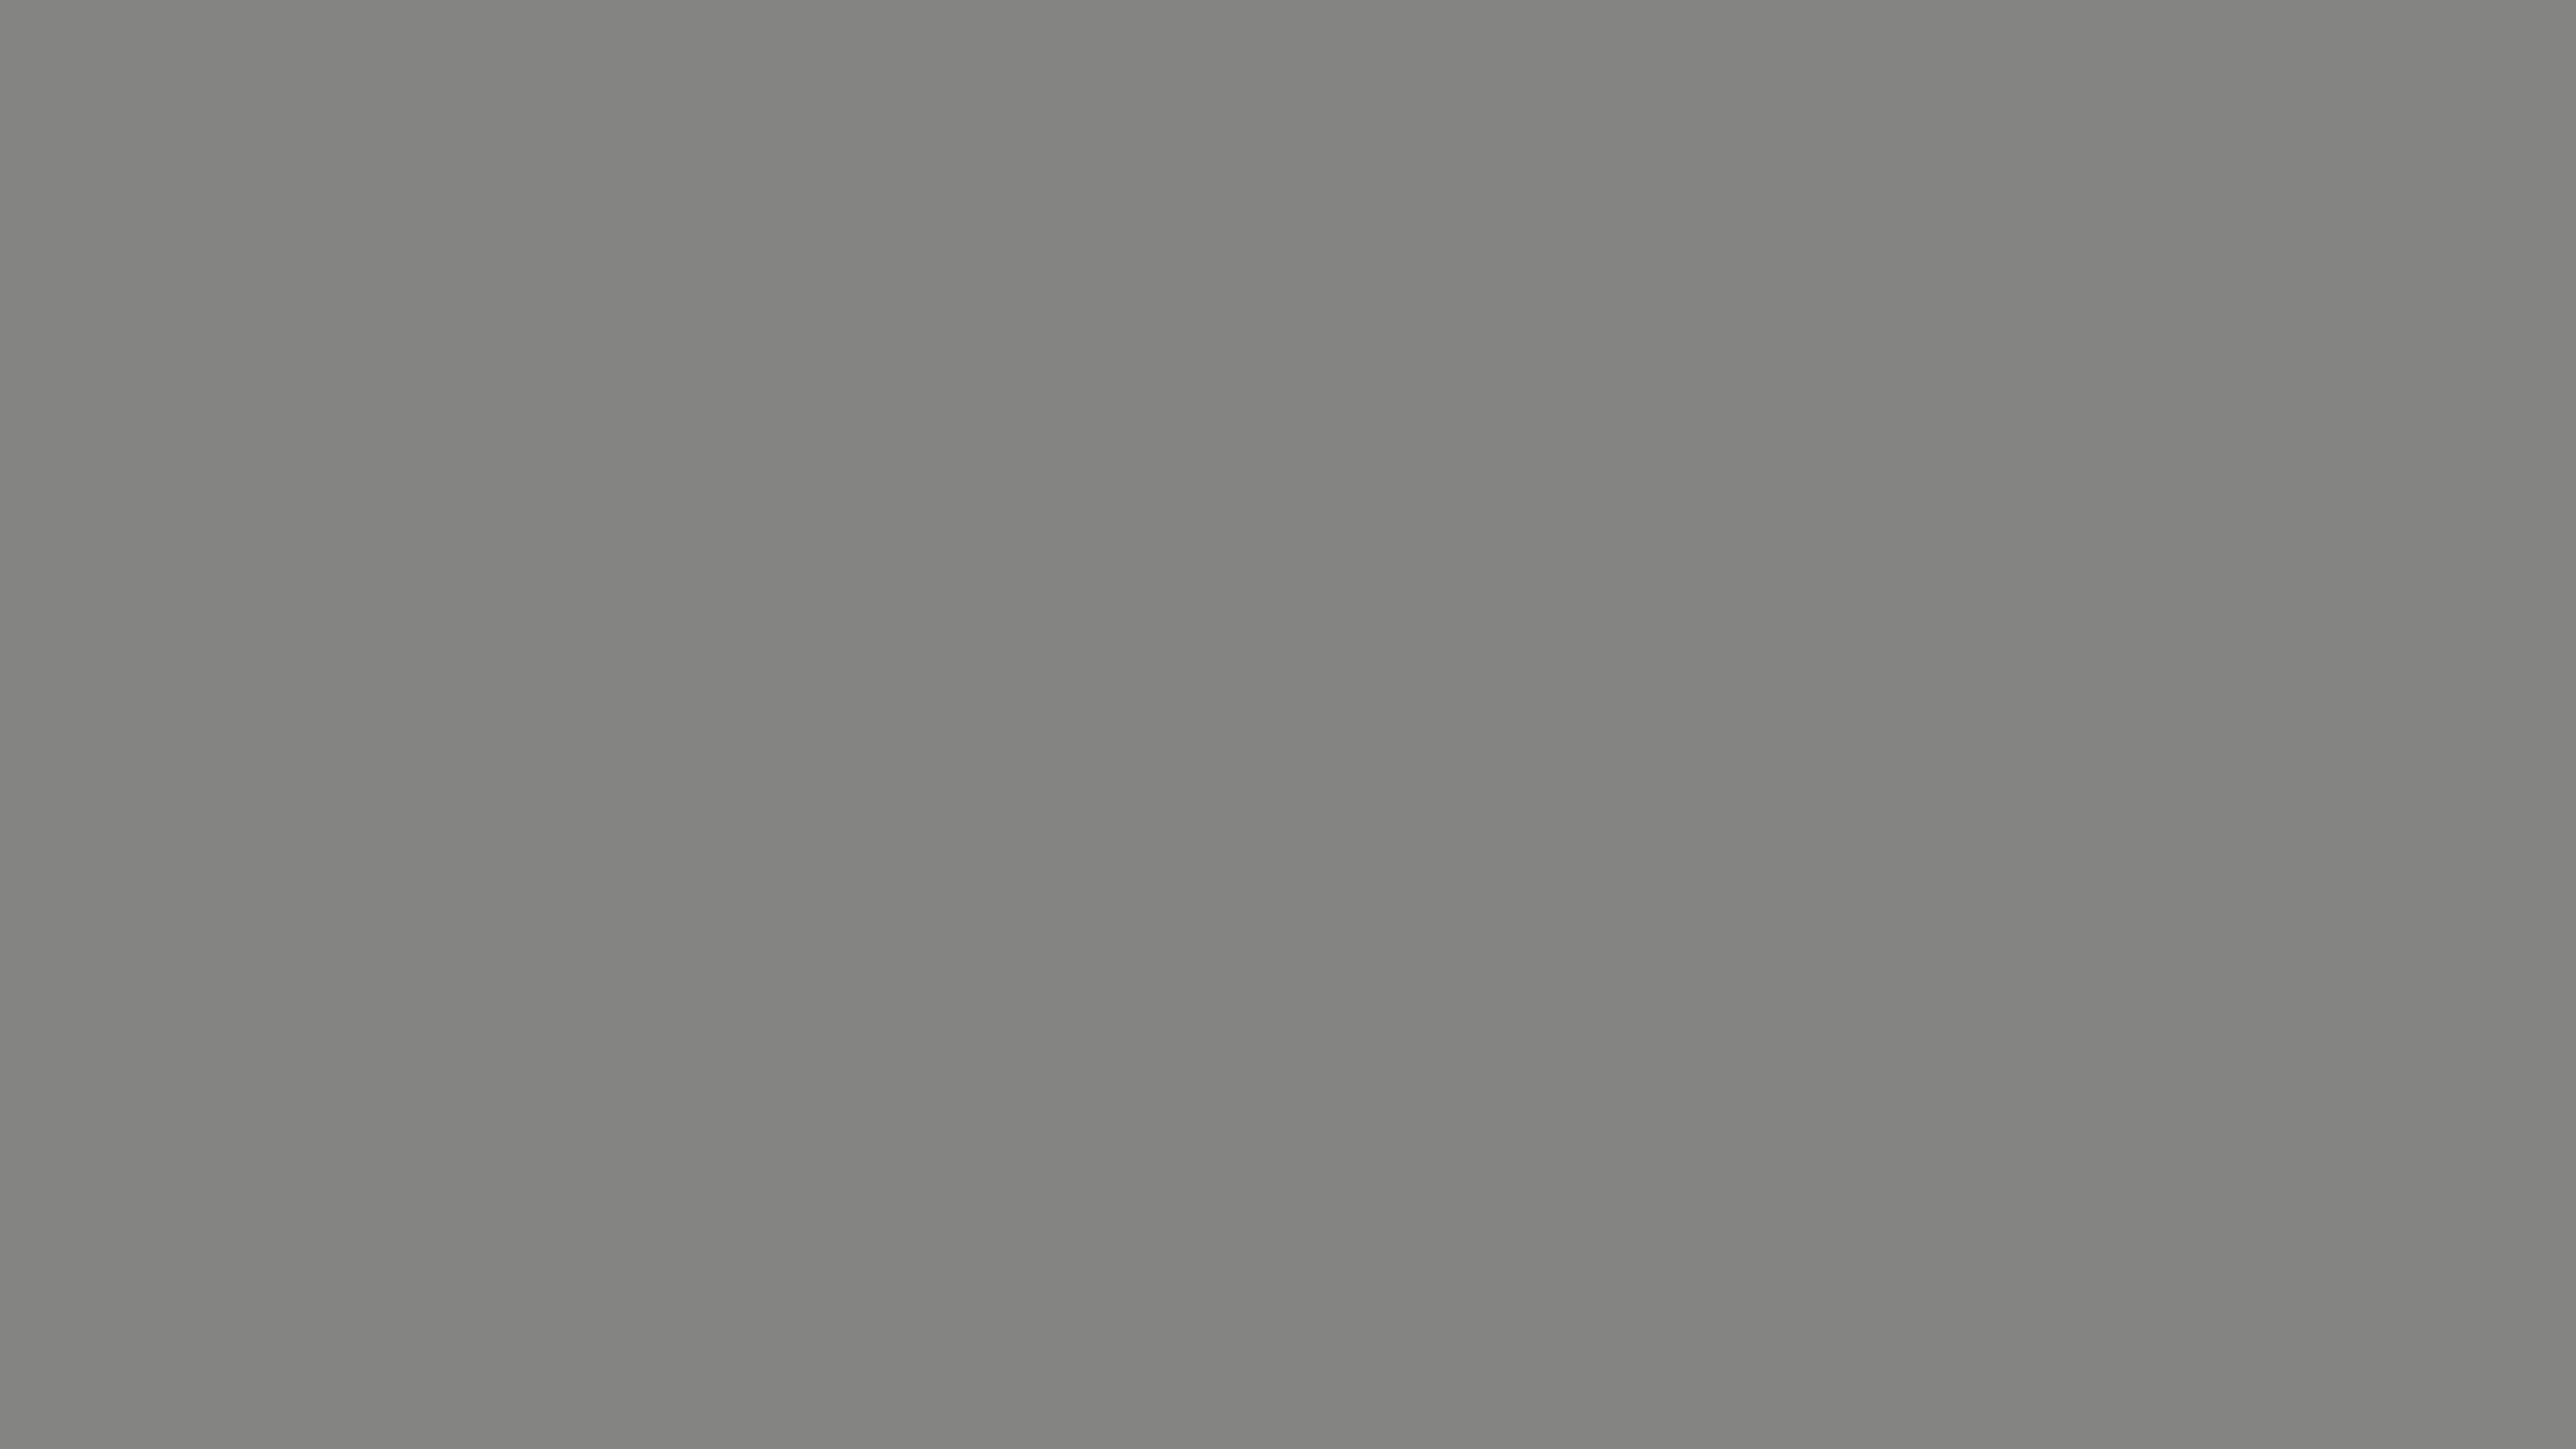 4096x2304 Battleship Grey Solid Color Background